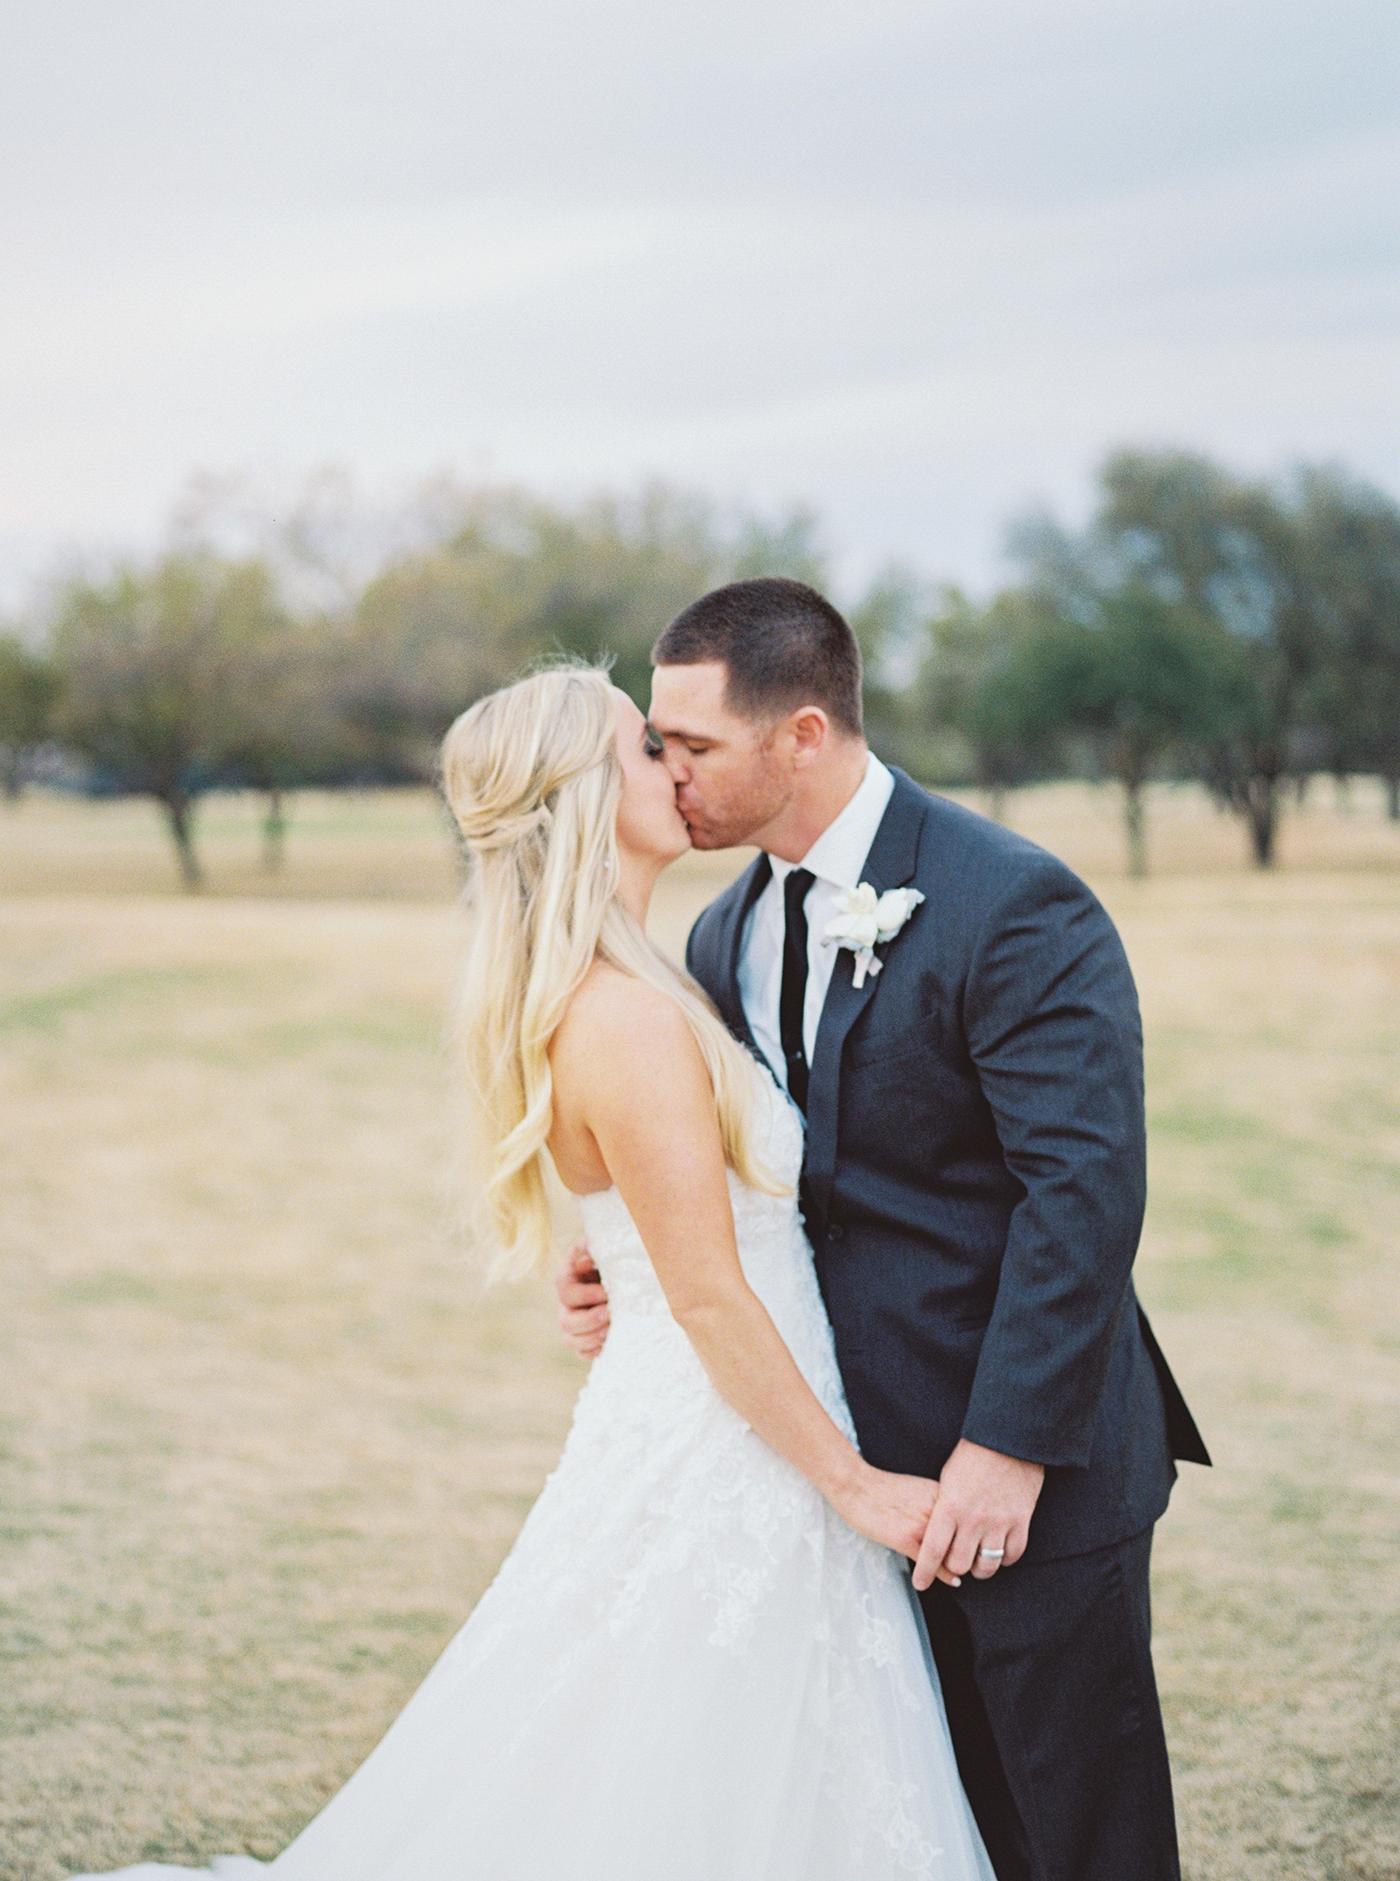 DFW Wedding Planner - Caroline + Jeff at The Four Seasons Hotel Wedding - Allday Events - 130.jpg